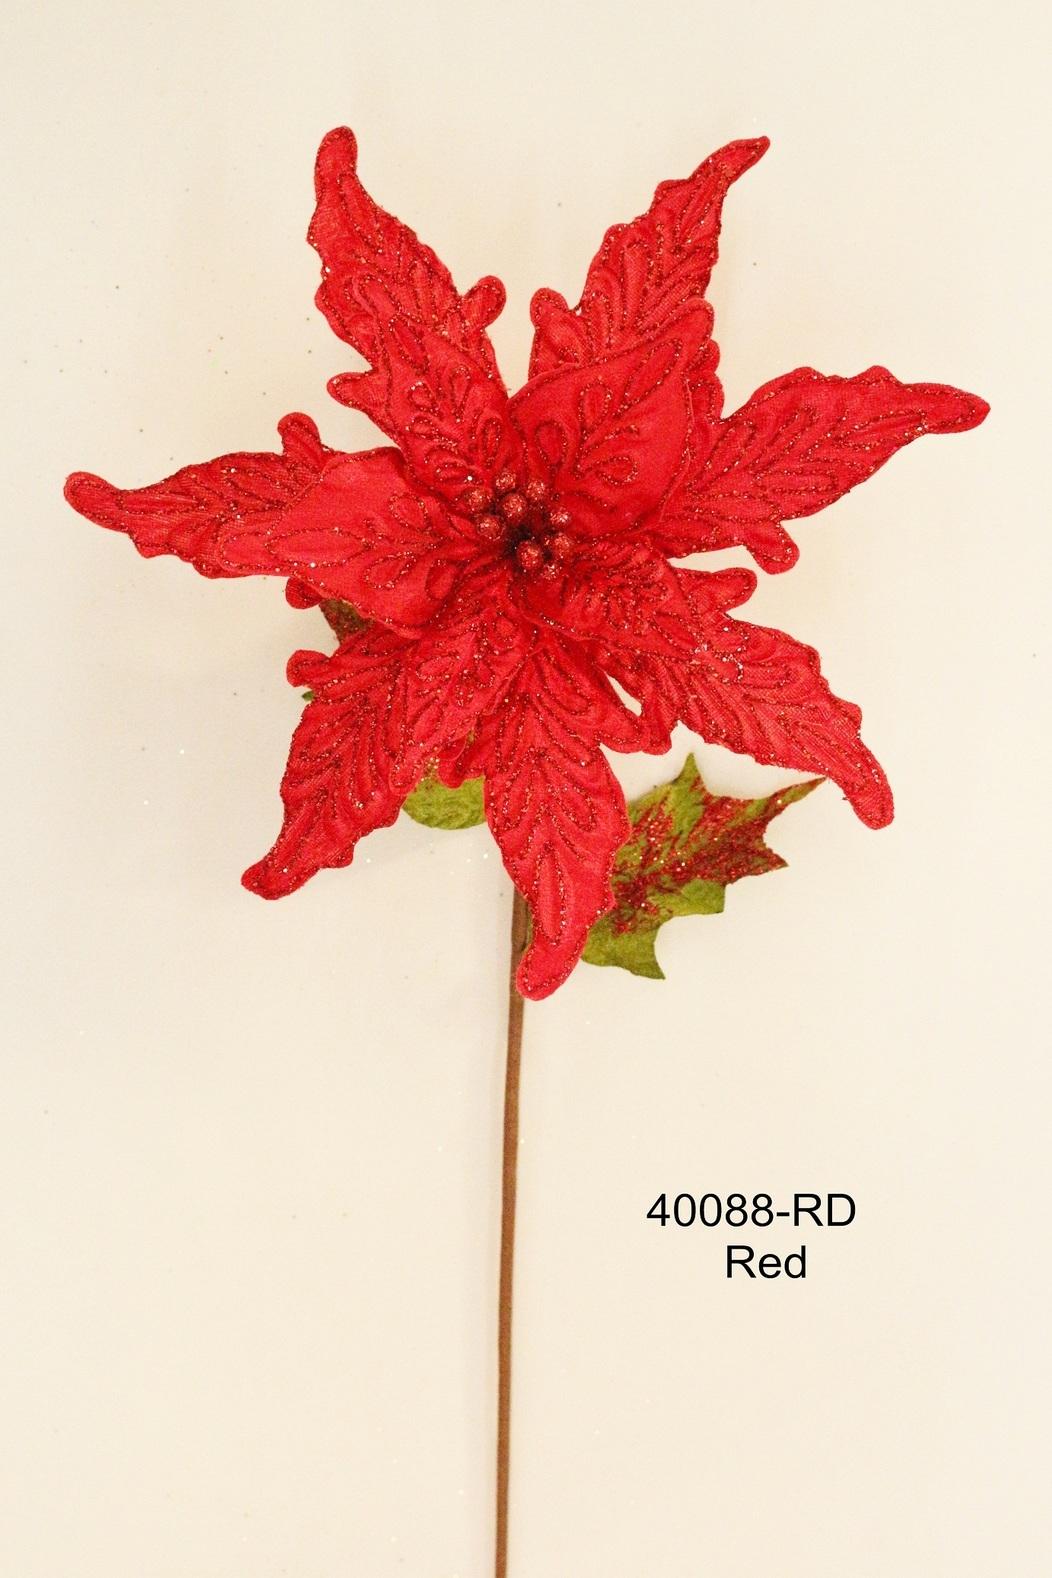 40088-RD